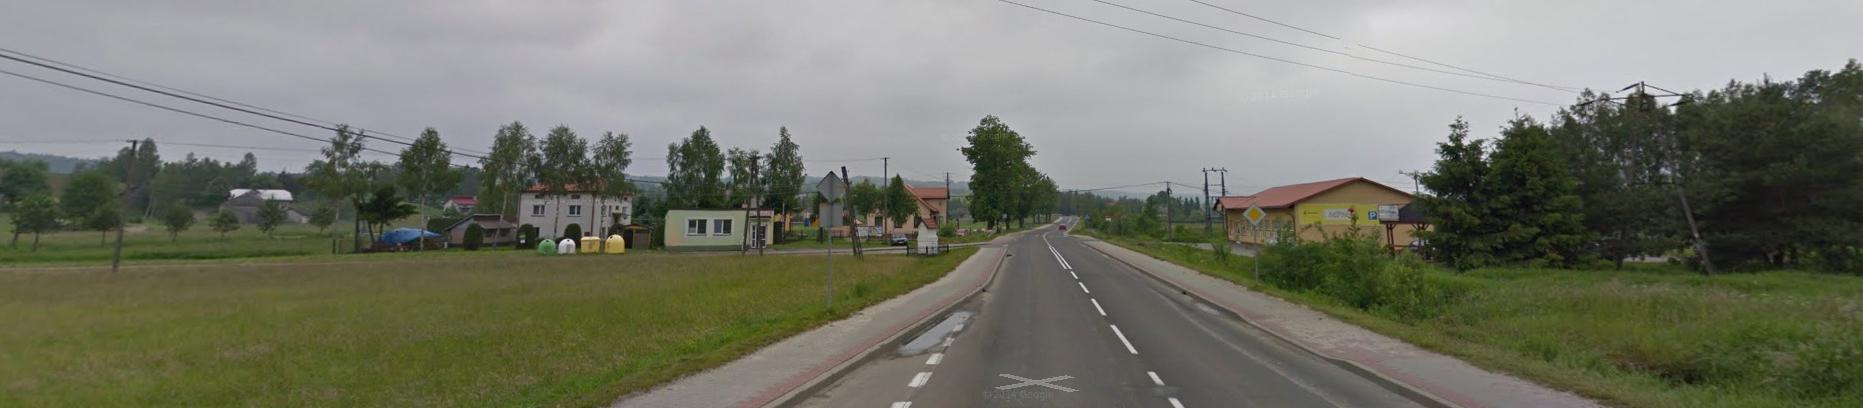 Lubla.pl